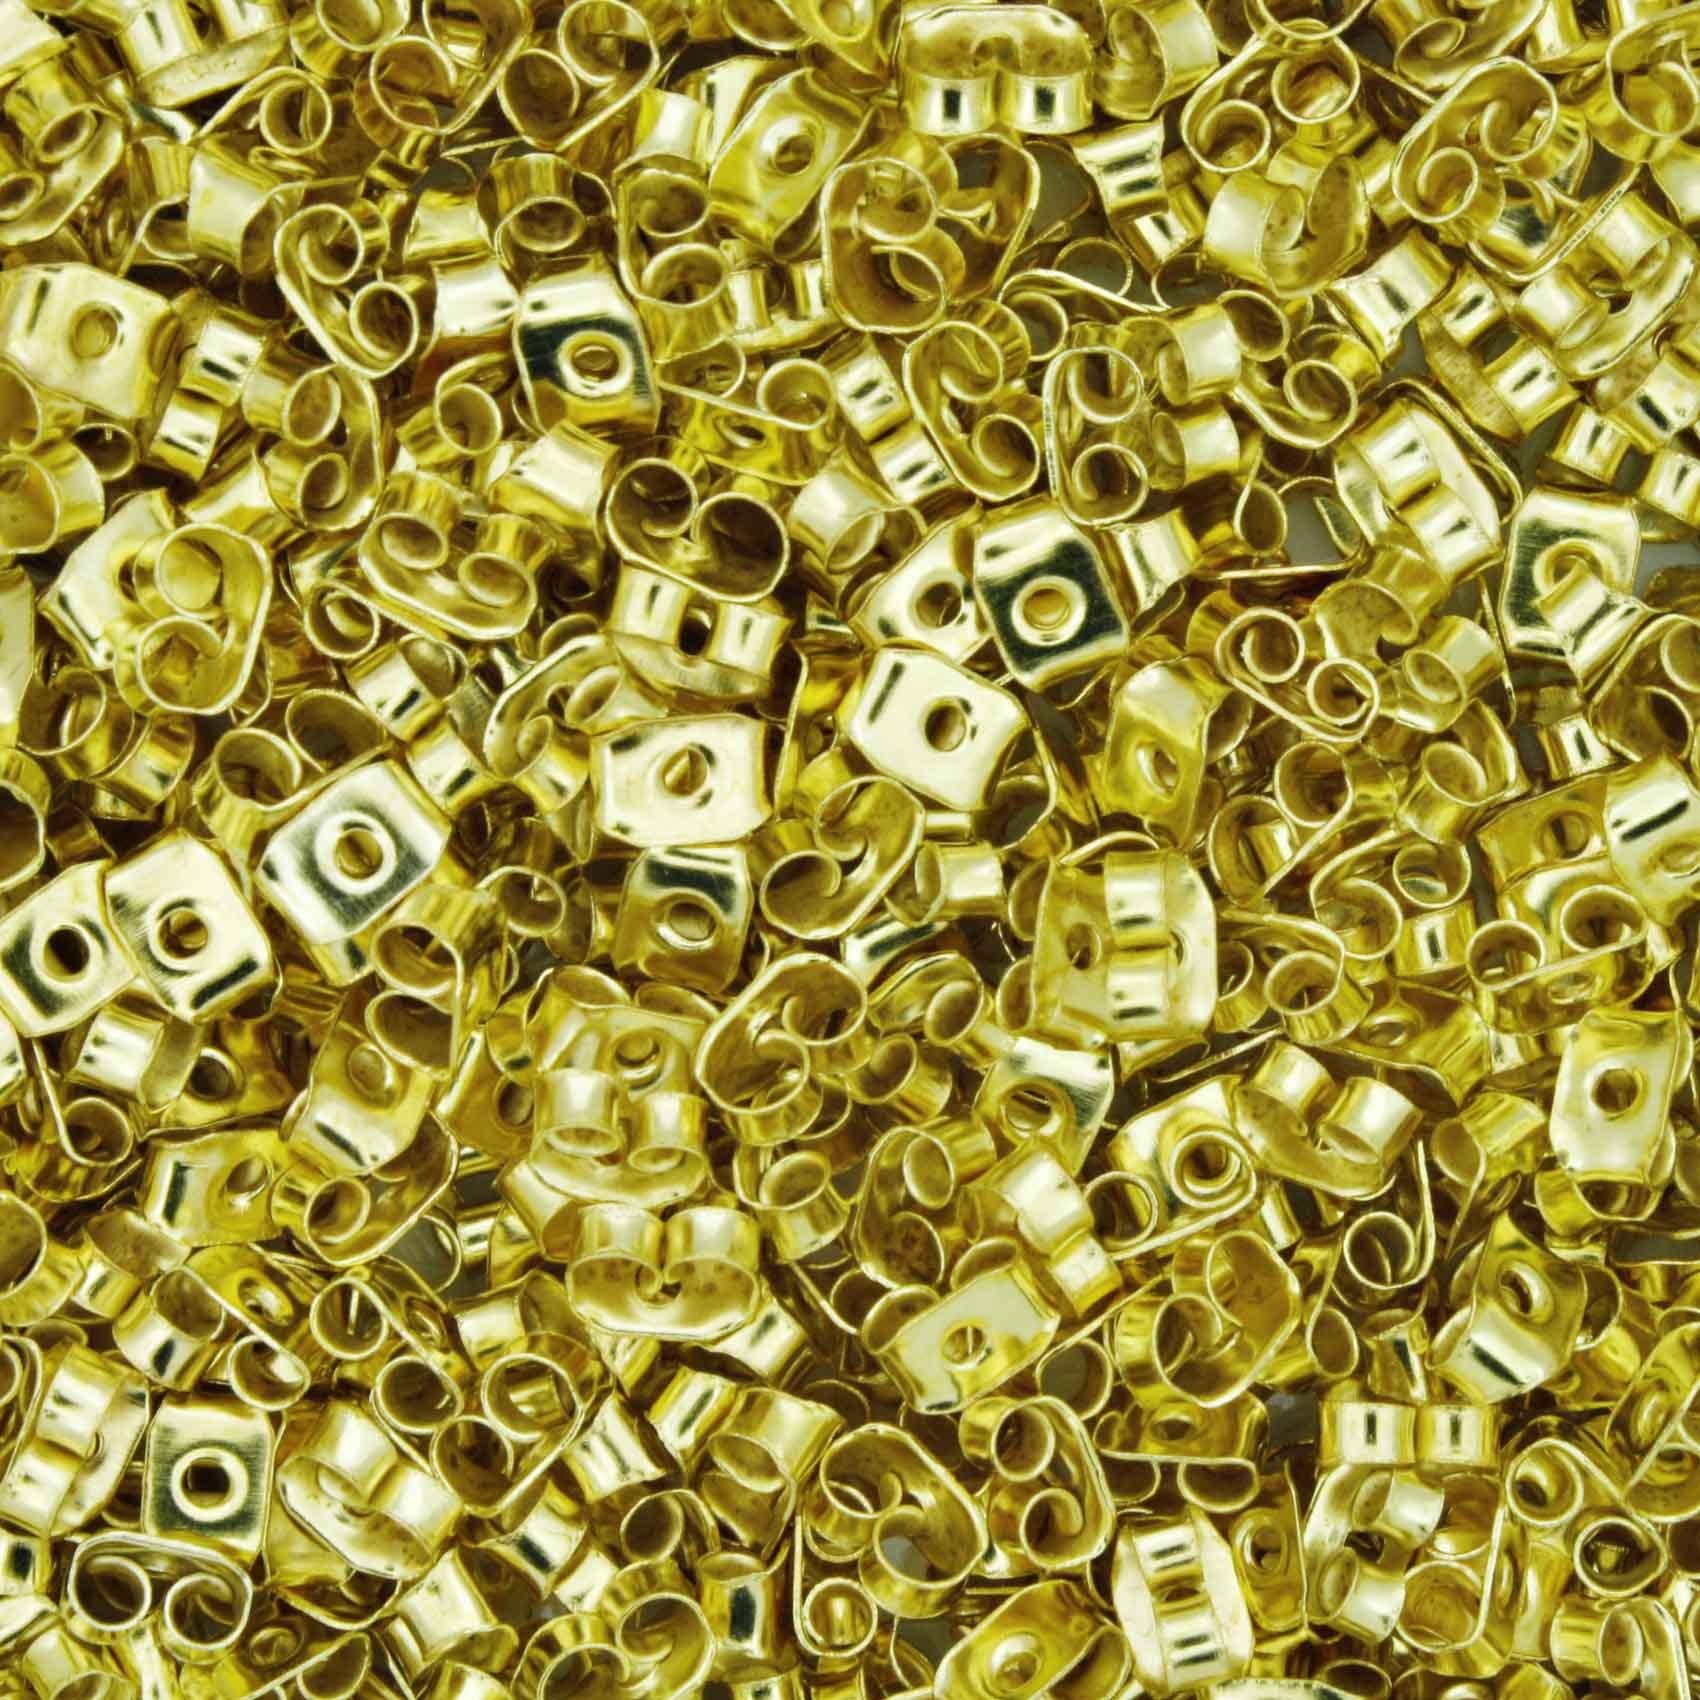 Tarraxa Borboleta - Dourada  - Stéphanie Bijoux® - Peças para Bijuterias e Artesanato